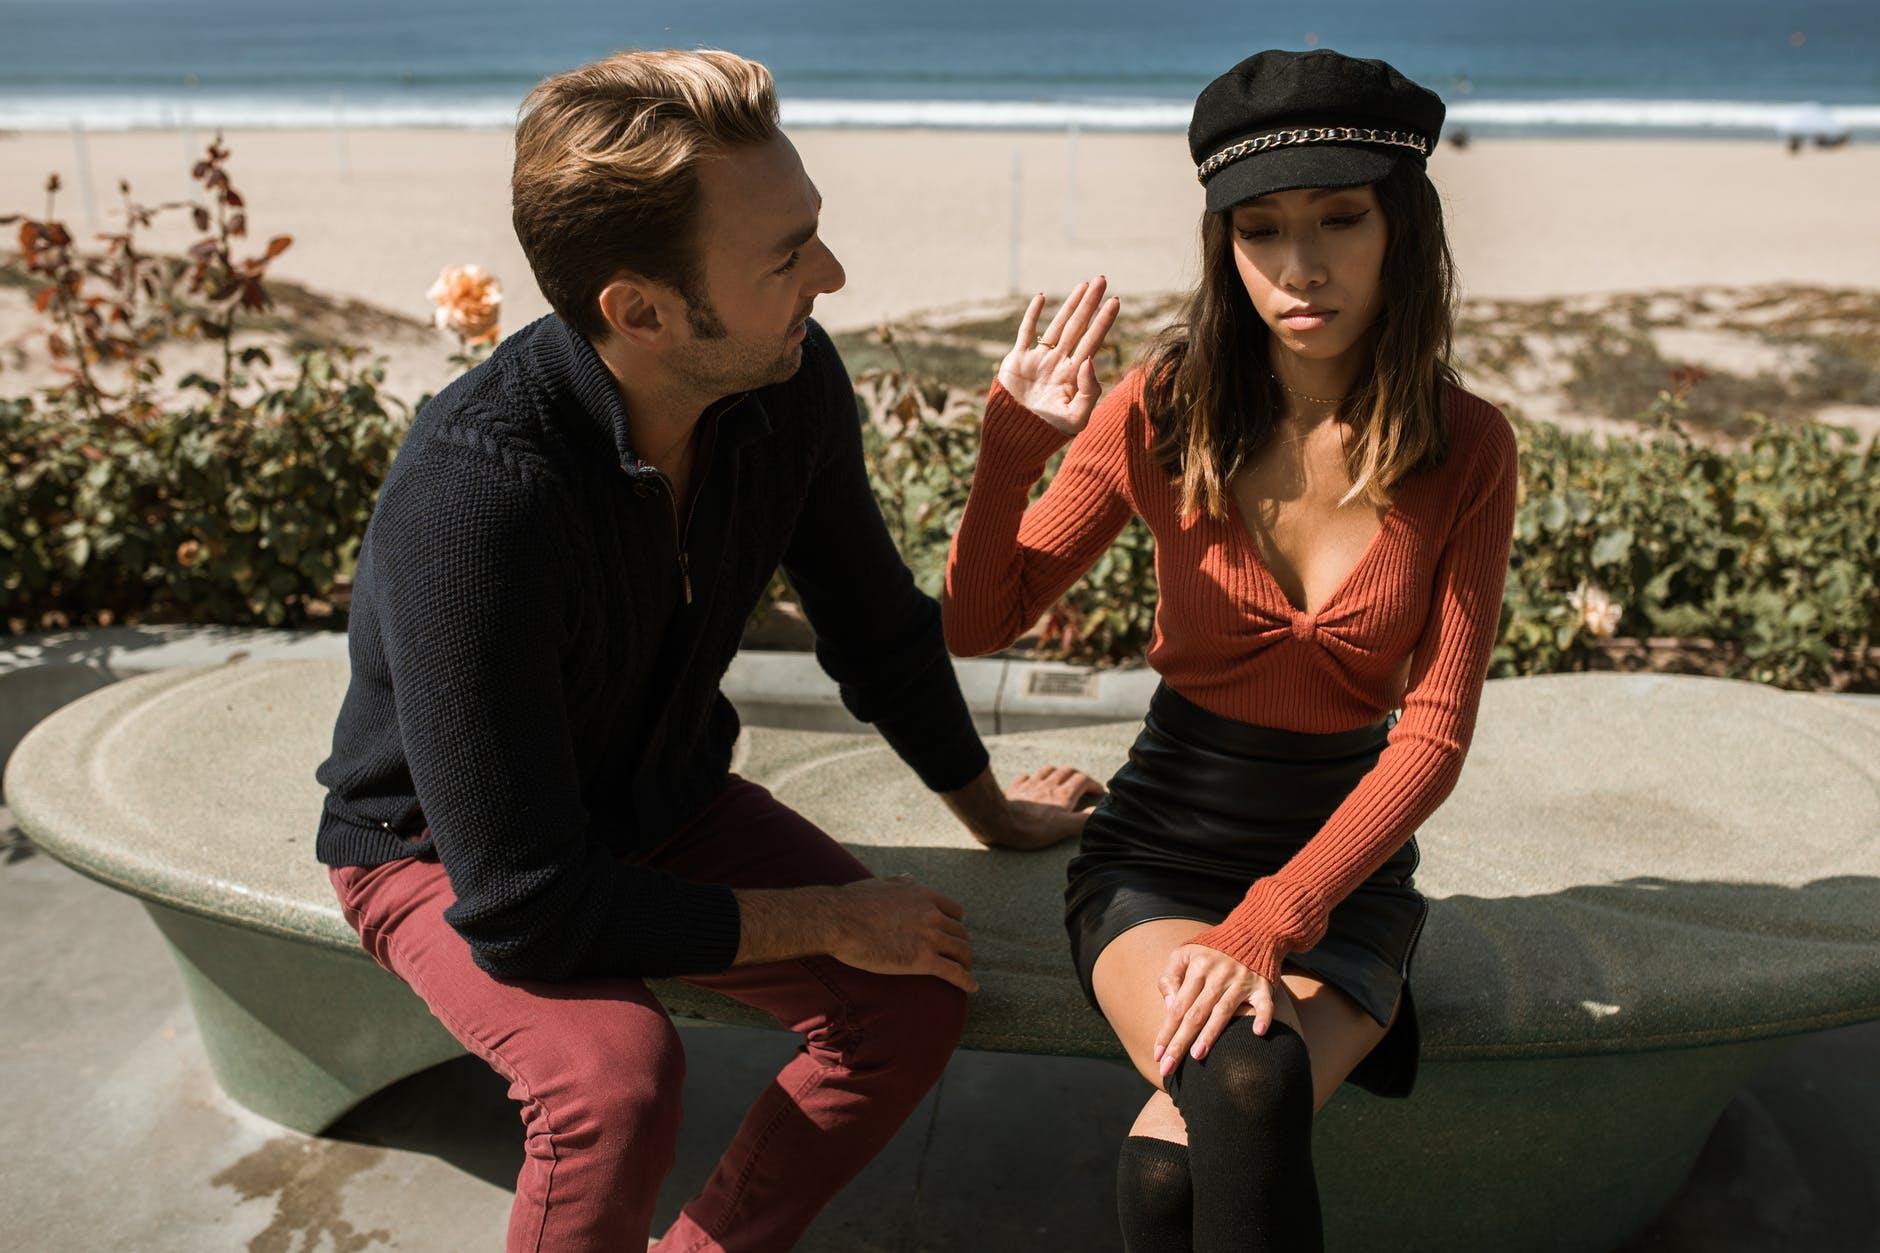 Staromodni muškarci i moderne žene  man talking to woman feeling upset